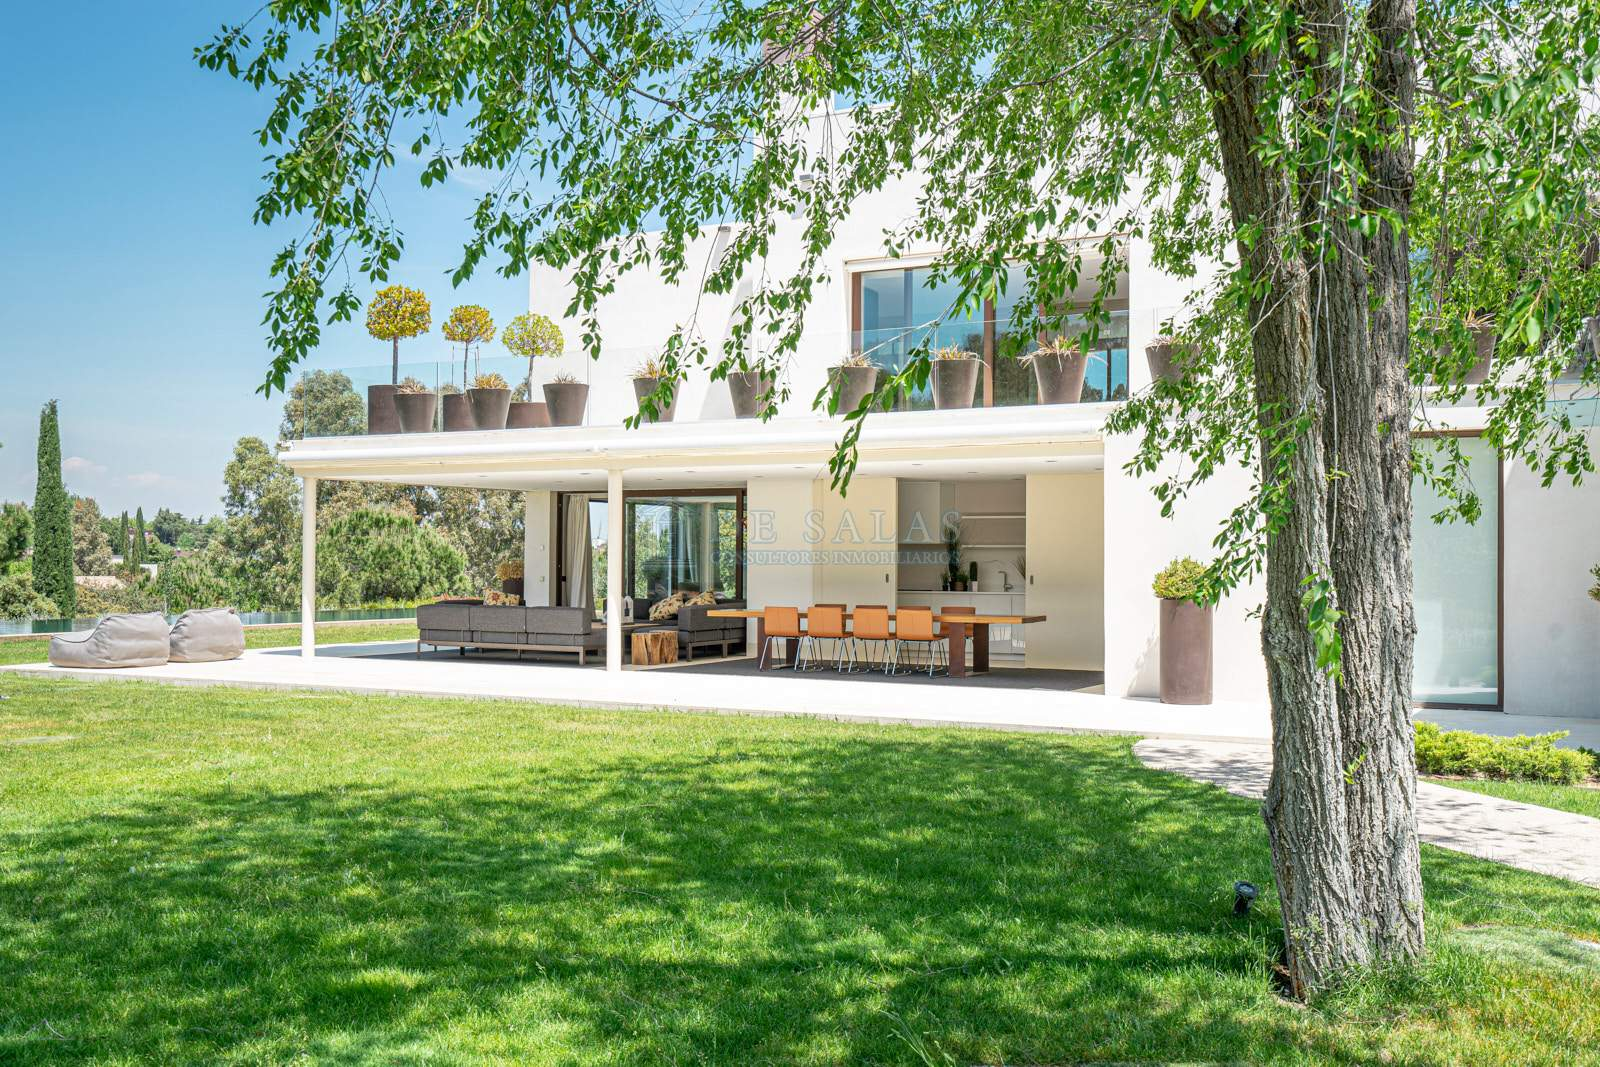 Jardín-0055 House La Moraleja